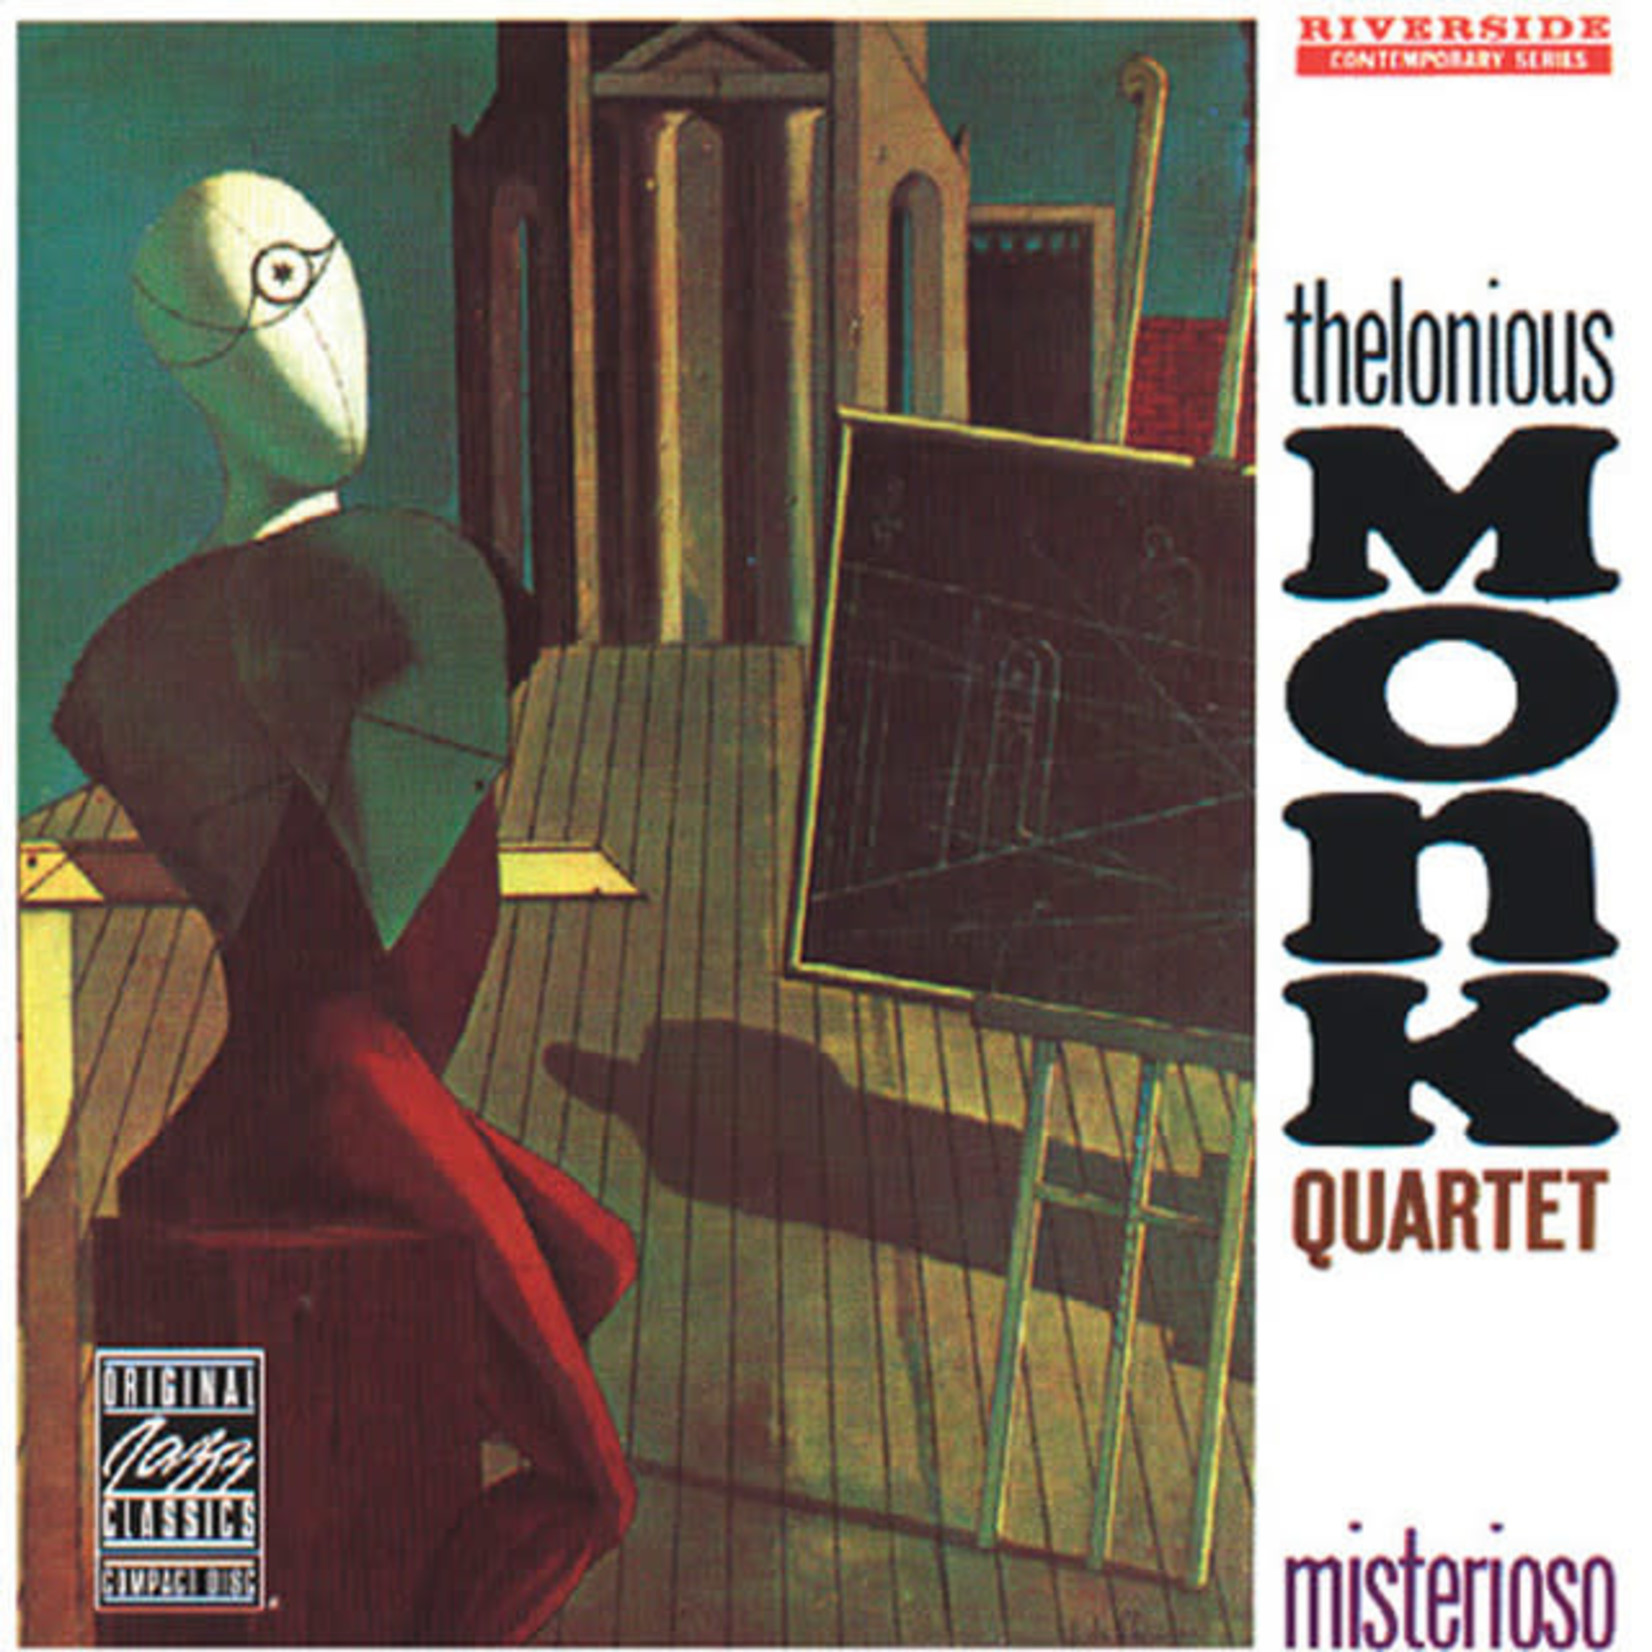 Vinyl Thelonious Monk - Misterioso